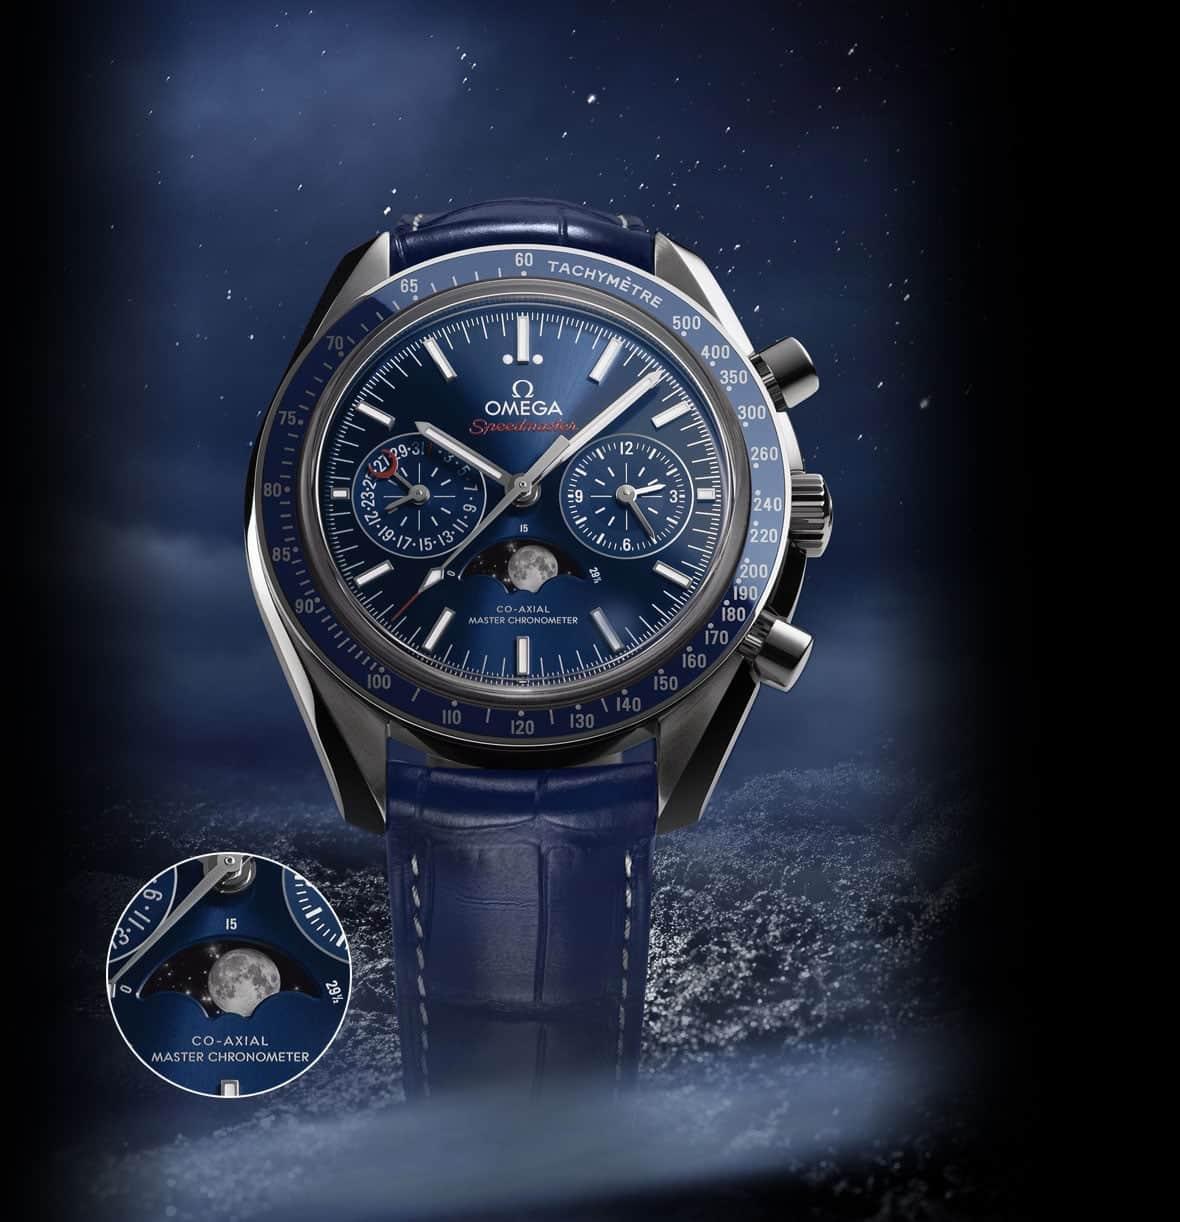 Omega-Speedmaster-Moonphase-Chronograph-Master-Chronometer-304.33.44.52.03.001-Highlight-Lionel-Meylan-Vevey